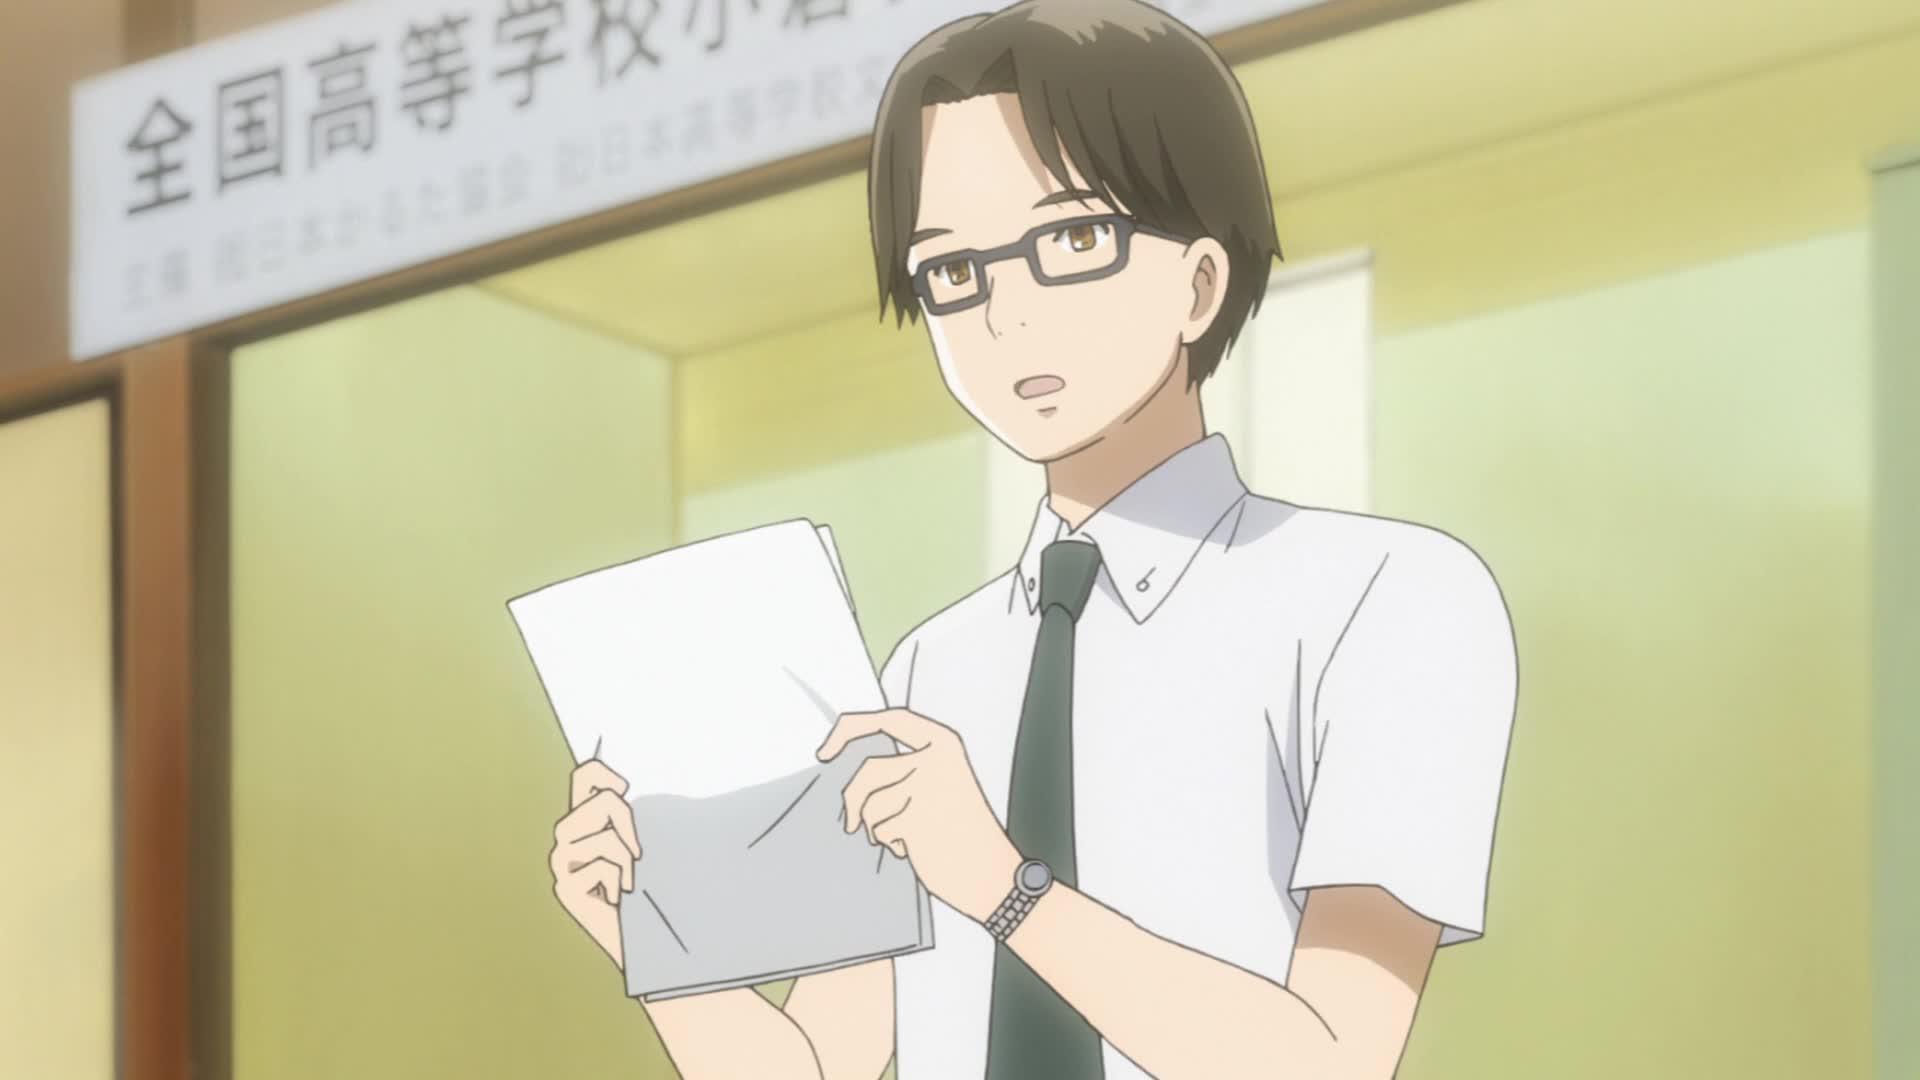 Chihayafuru 2 - Episode 24